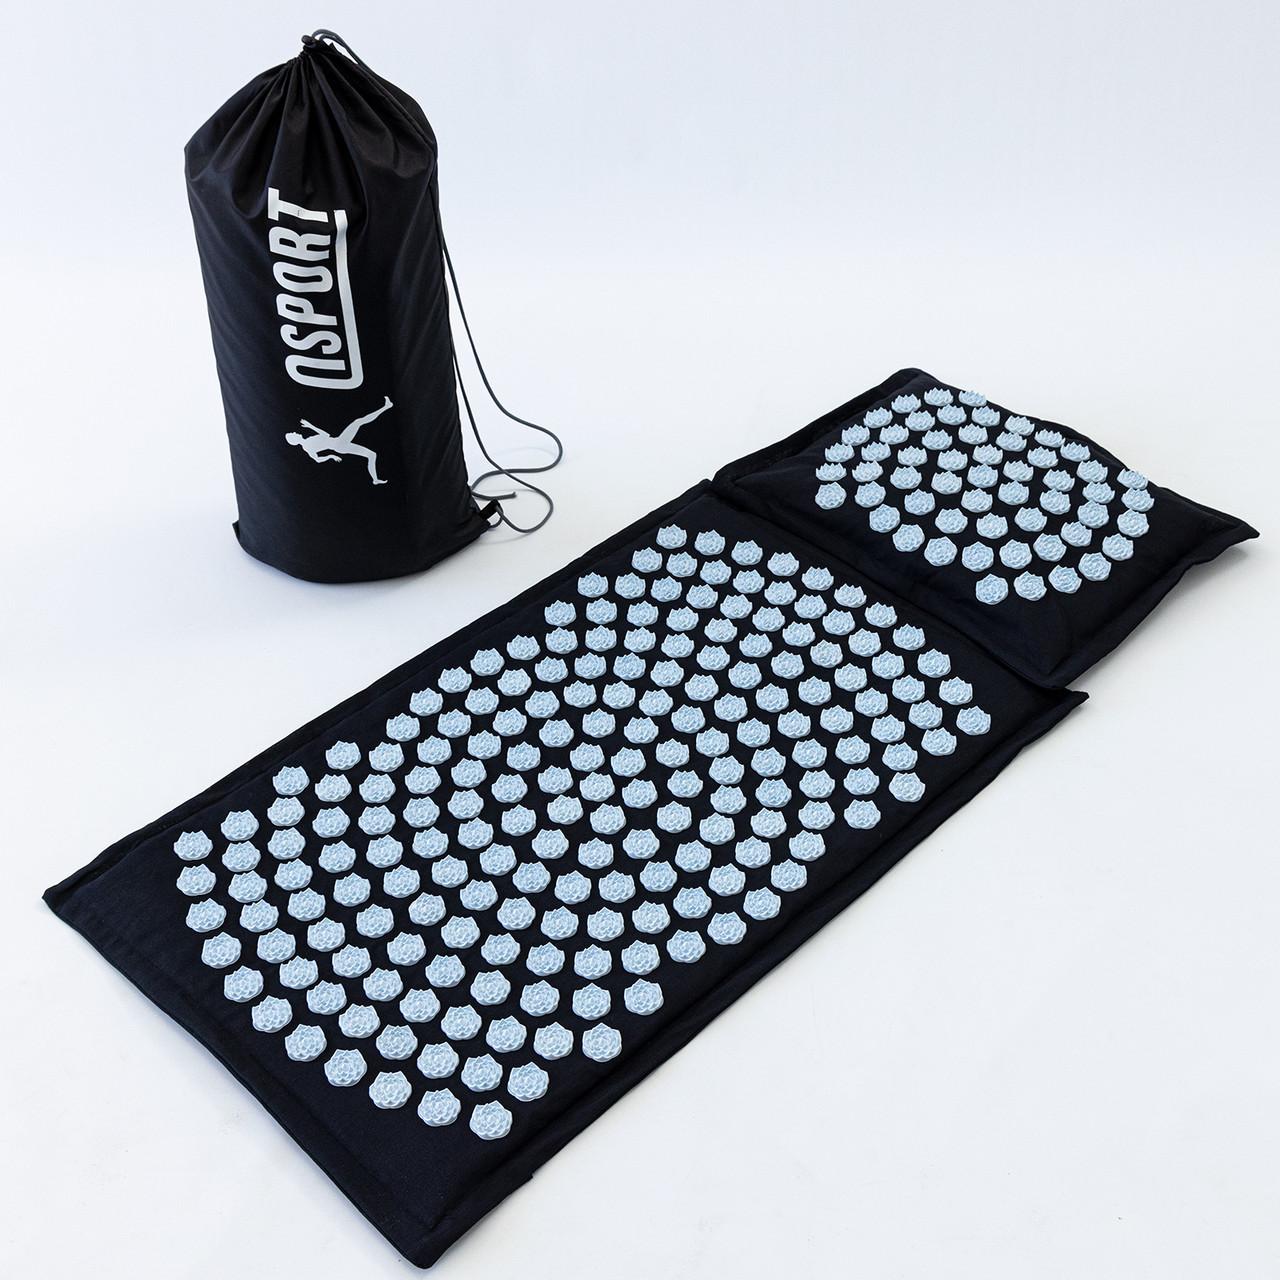 Масажний килимок Аплікатор Кузнєцова + масажна подушка масажер для шиї OSPORT Lotus Mat Eco (apl-020)